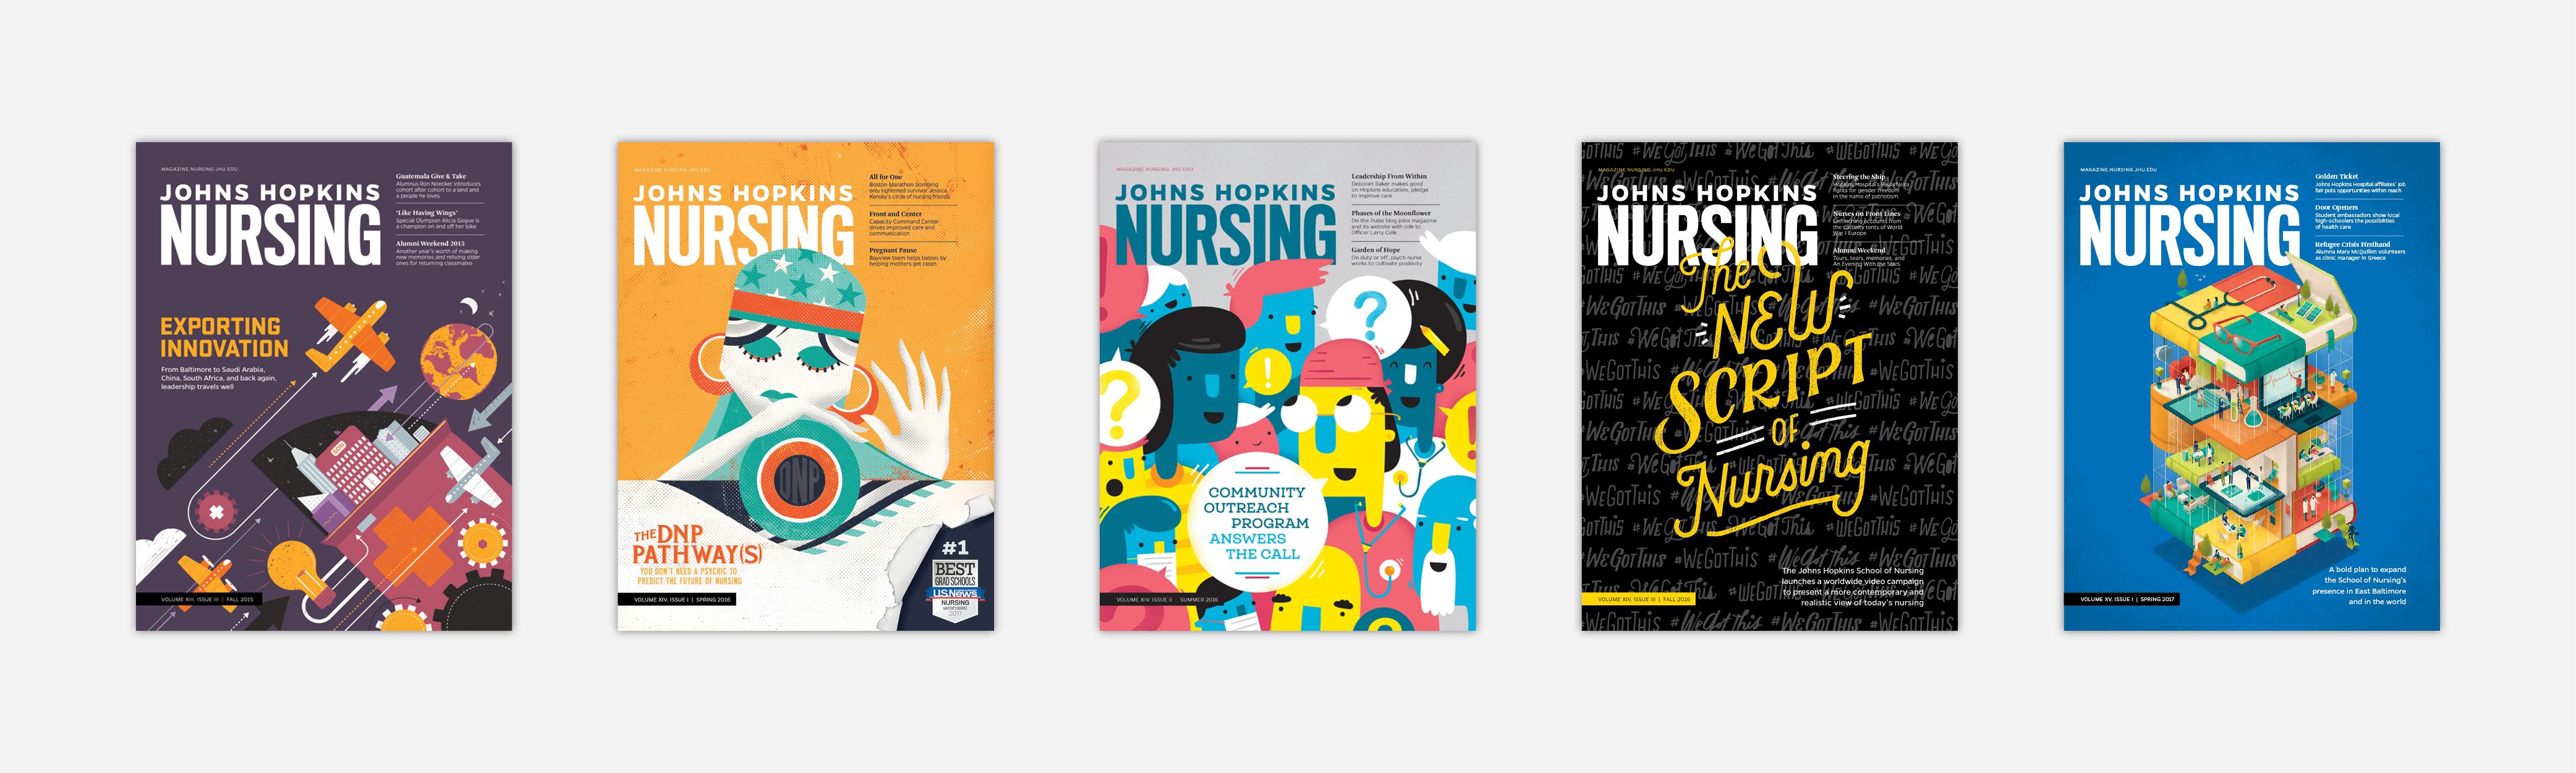 Johns Hopkins Nursing Magazine